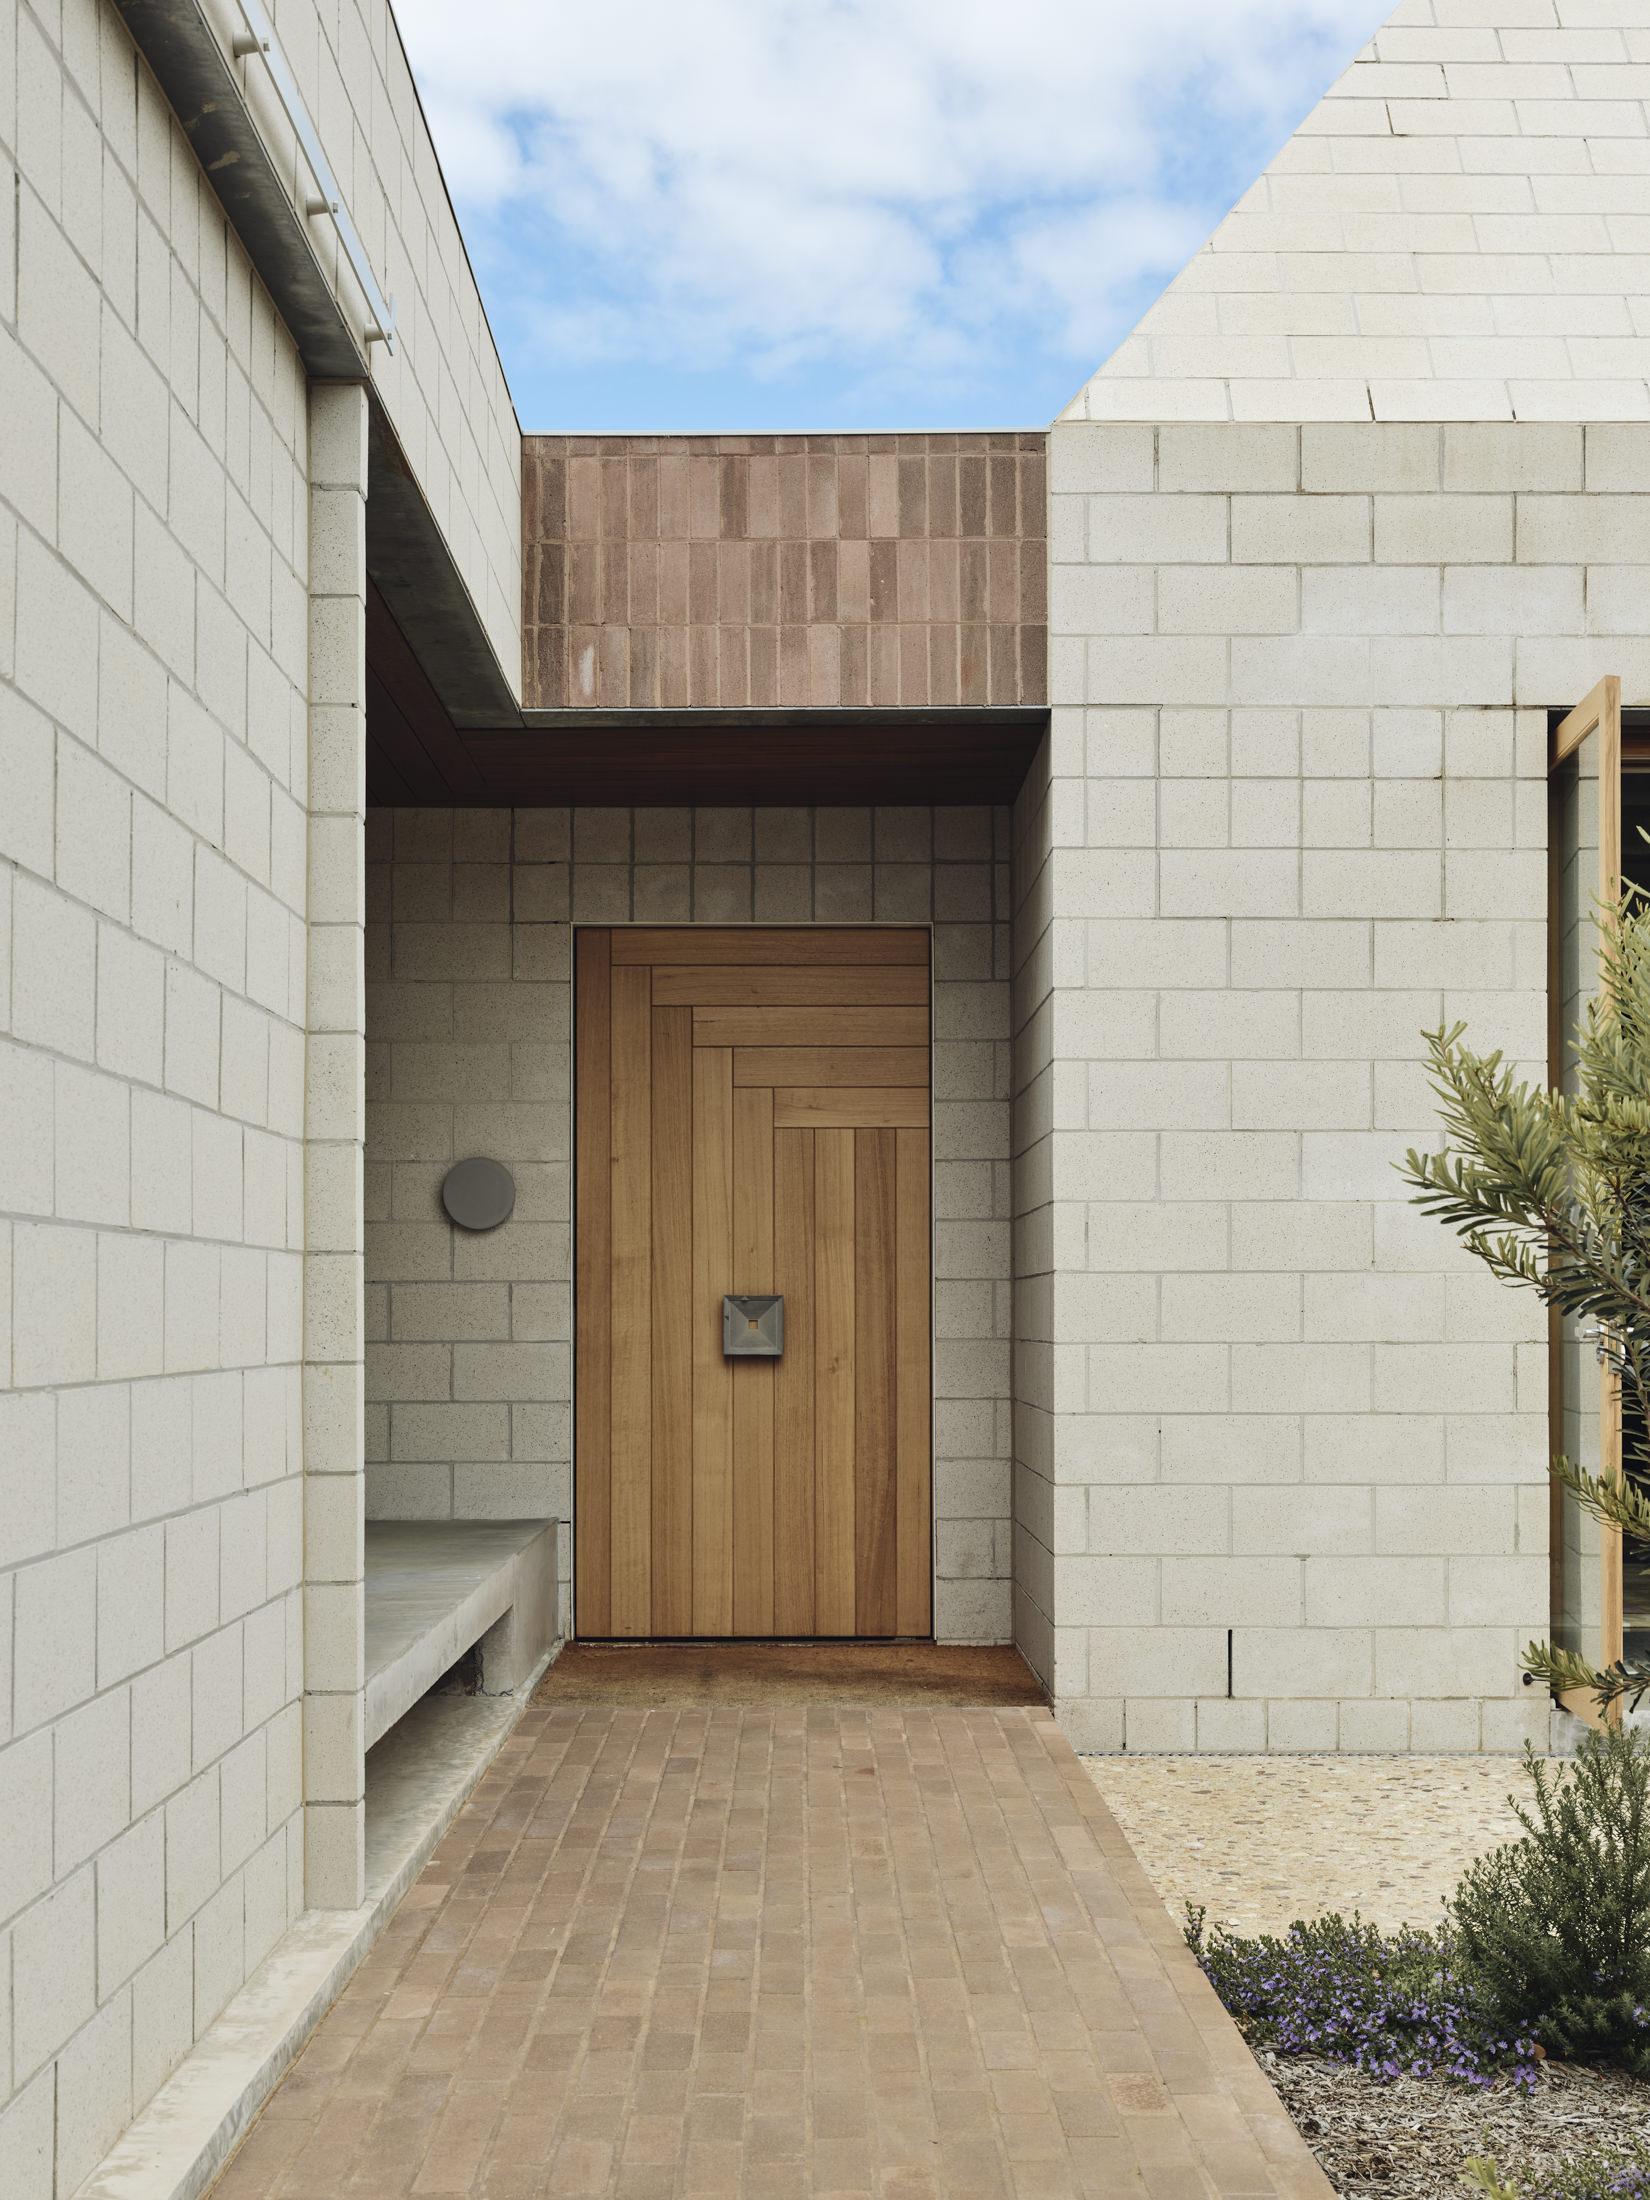 Architects Eat Bellows Beach House Flinders Masonry Architecture Photo Derek Swalwell Yellowtrace 15